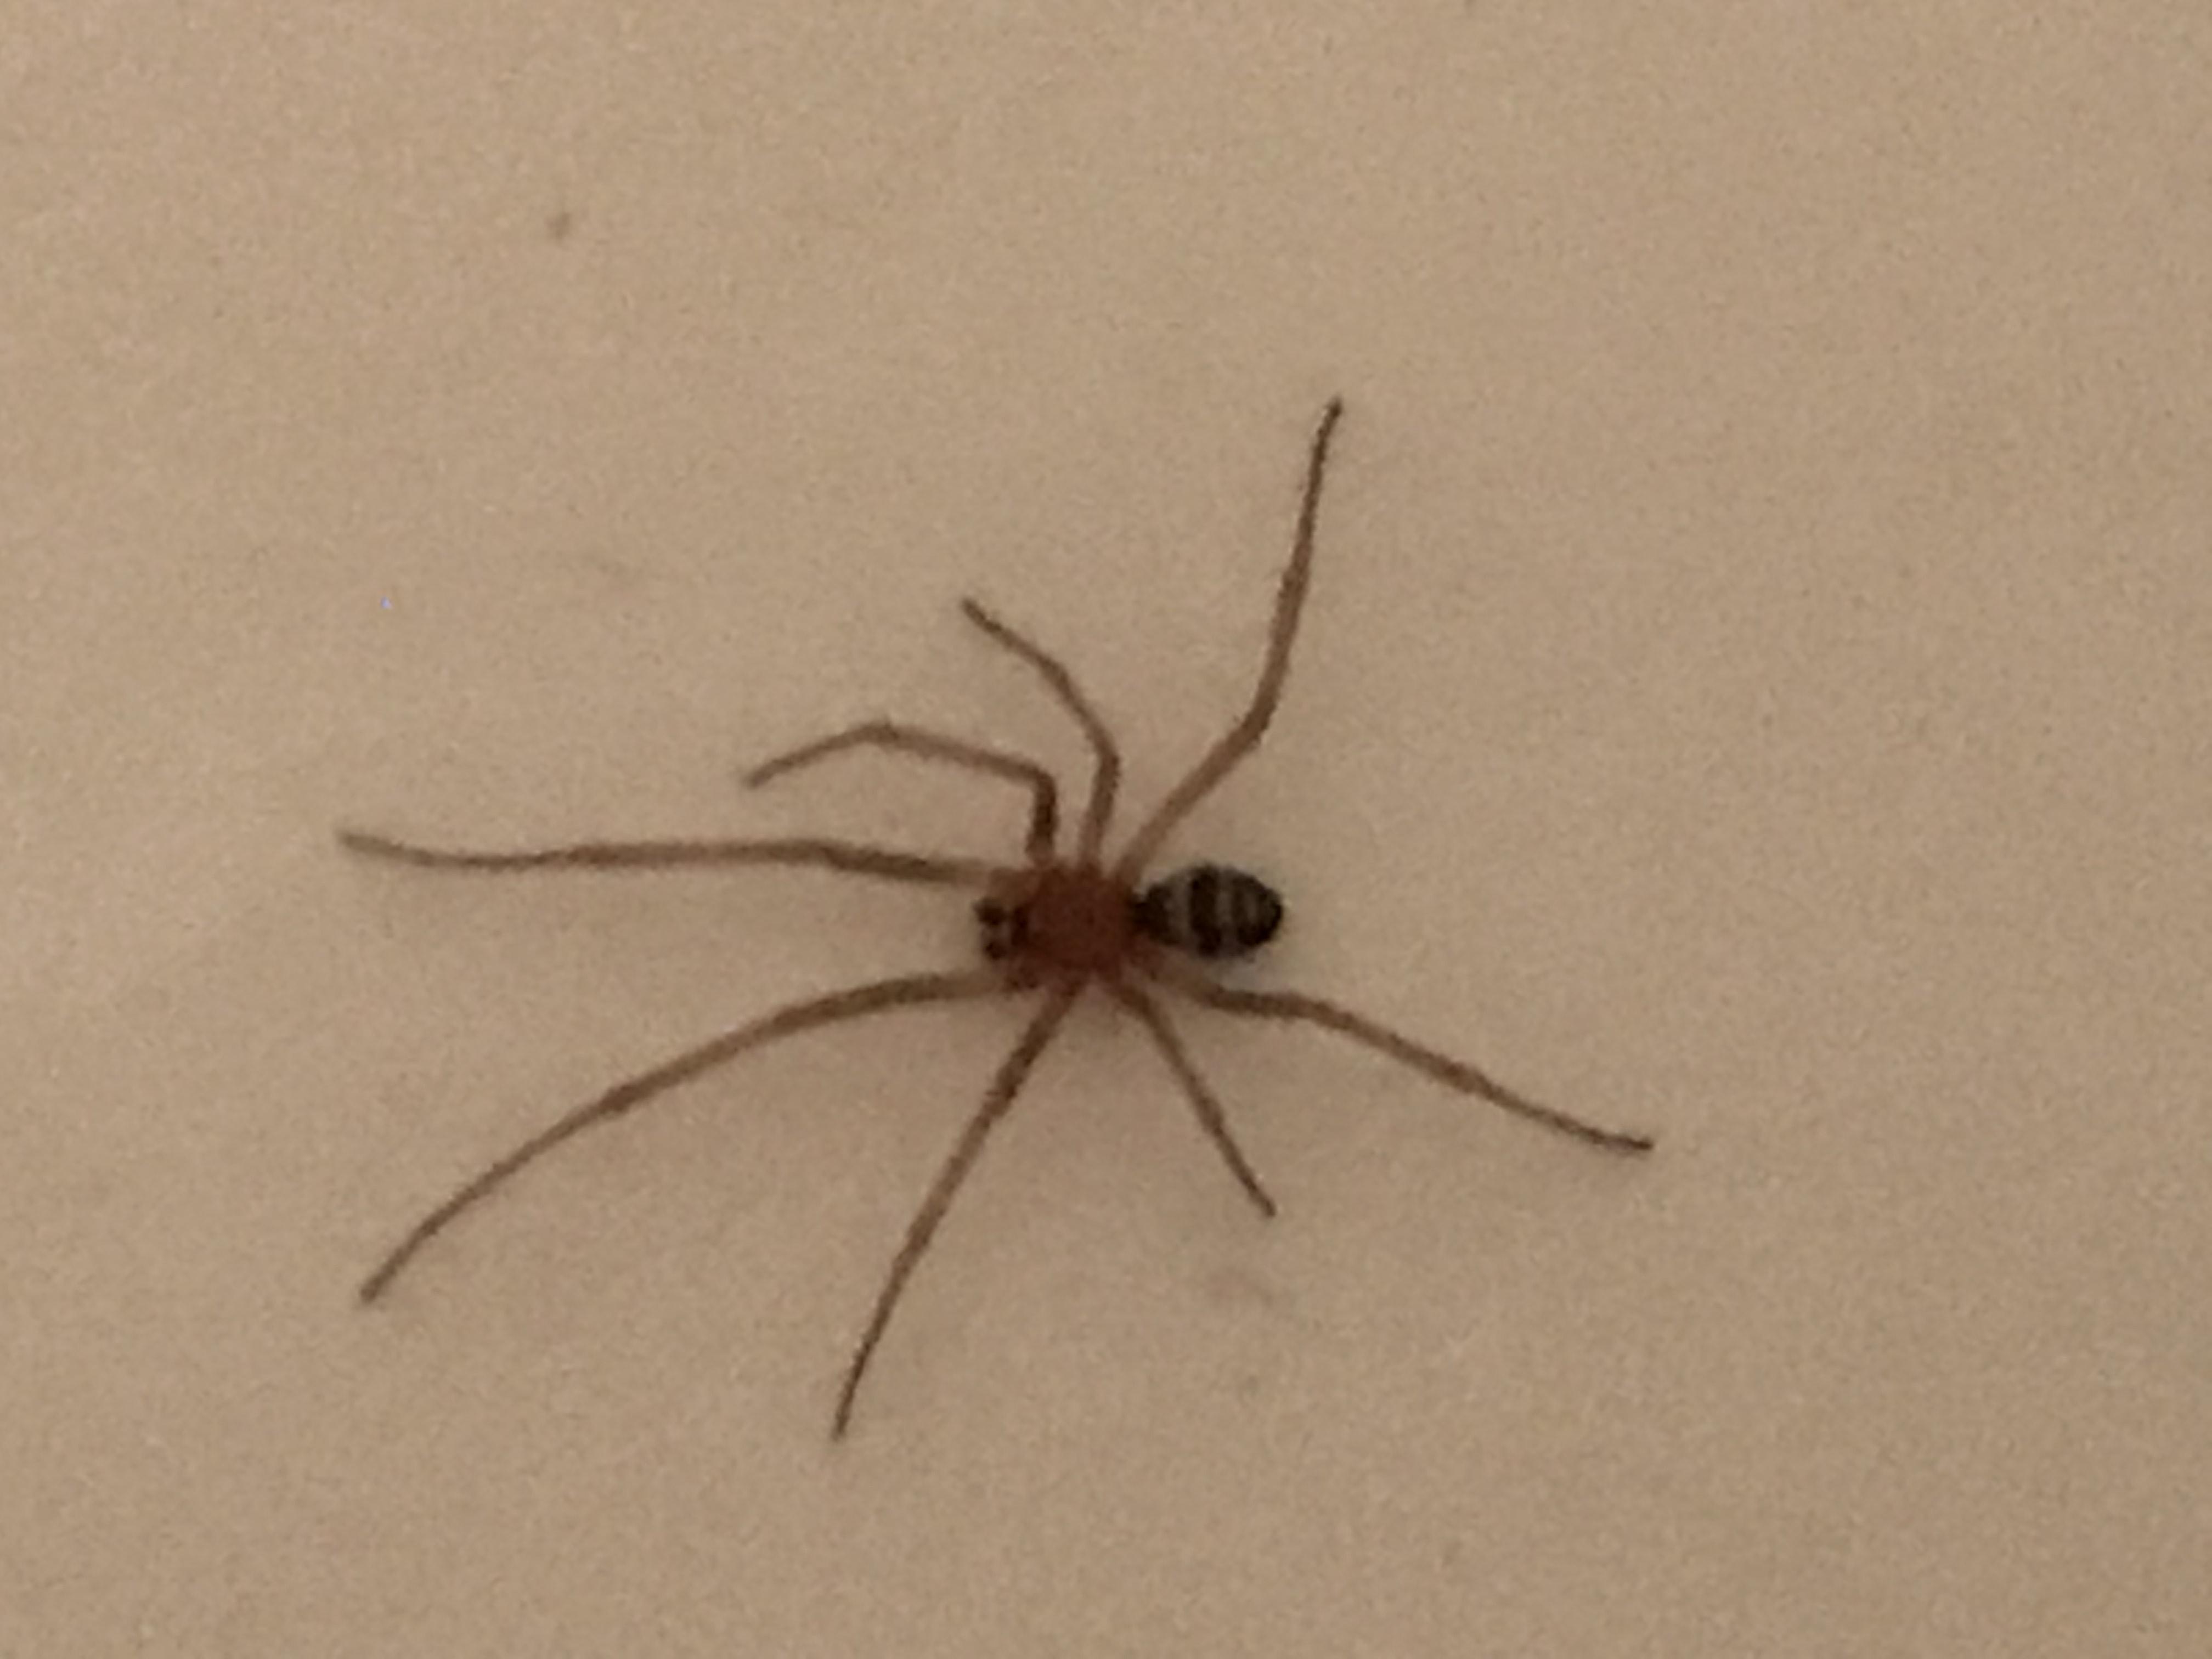 Picture of Steatoda grossa (False Black Widow) - Male - Dorsal